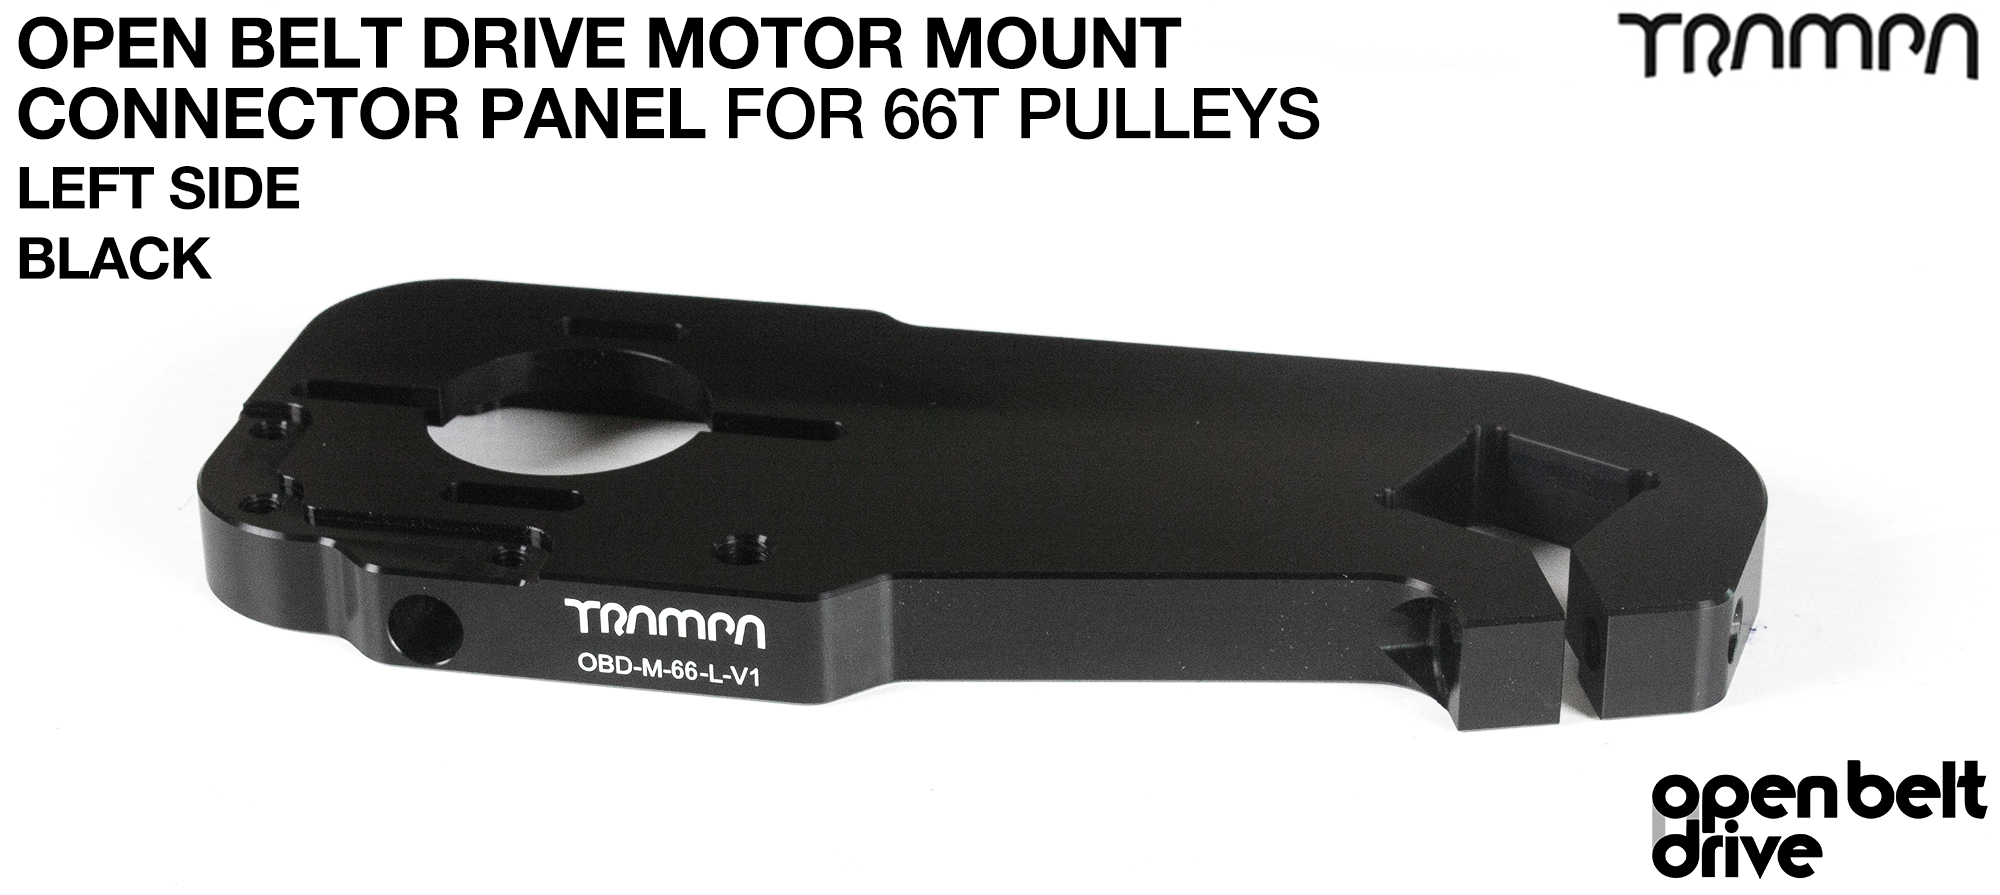 OBD Open Belt Drive Motor Mount Connector Panel for 66 tooth Pulleys - REGULAR - BLACK